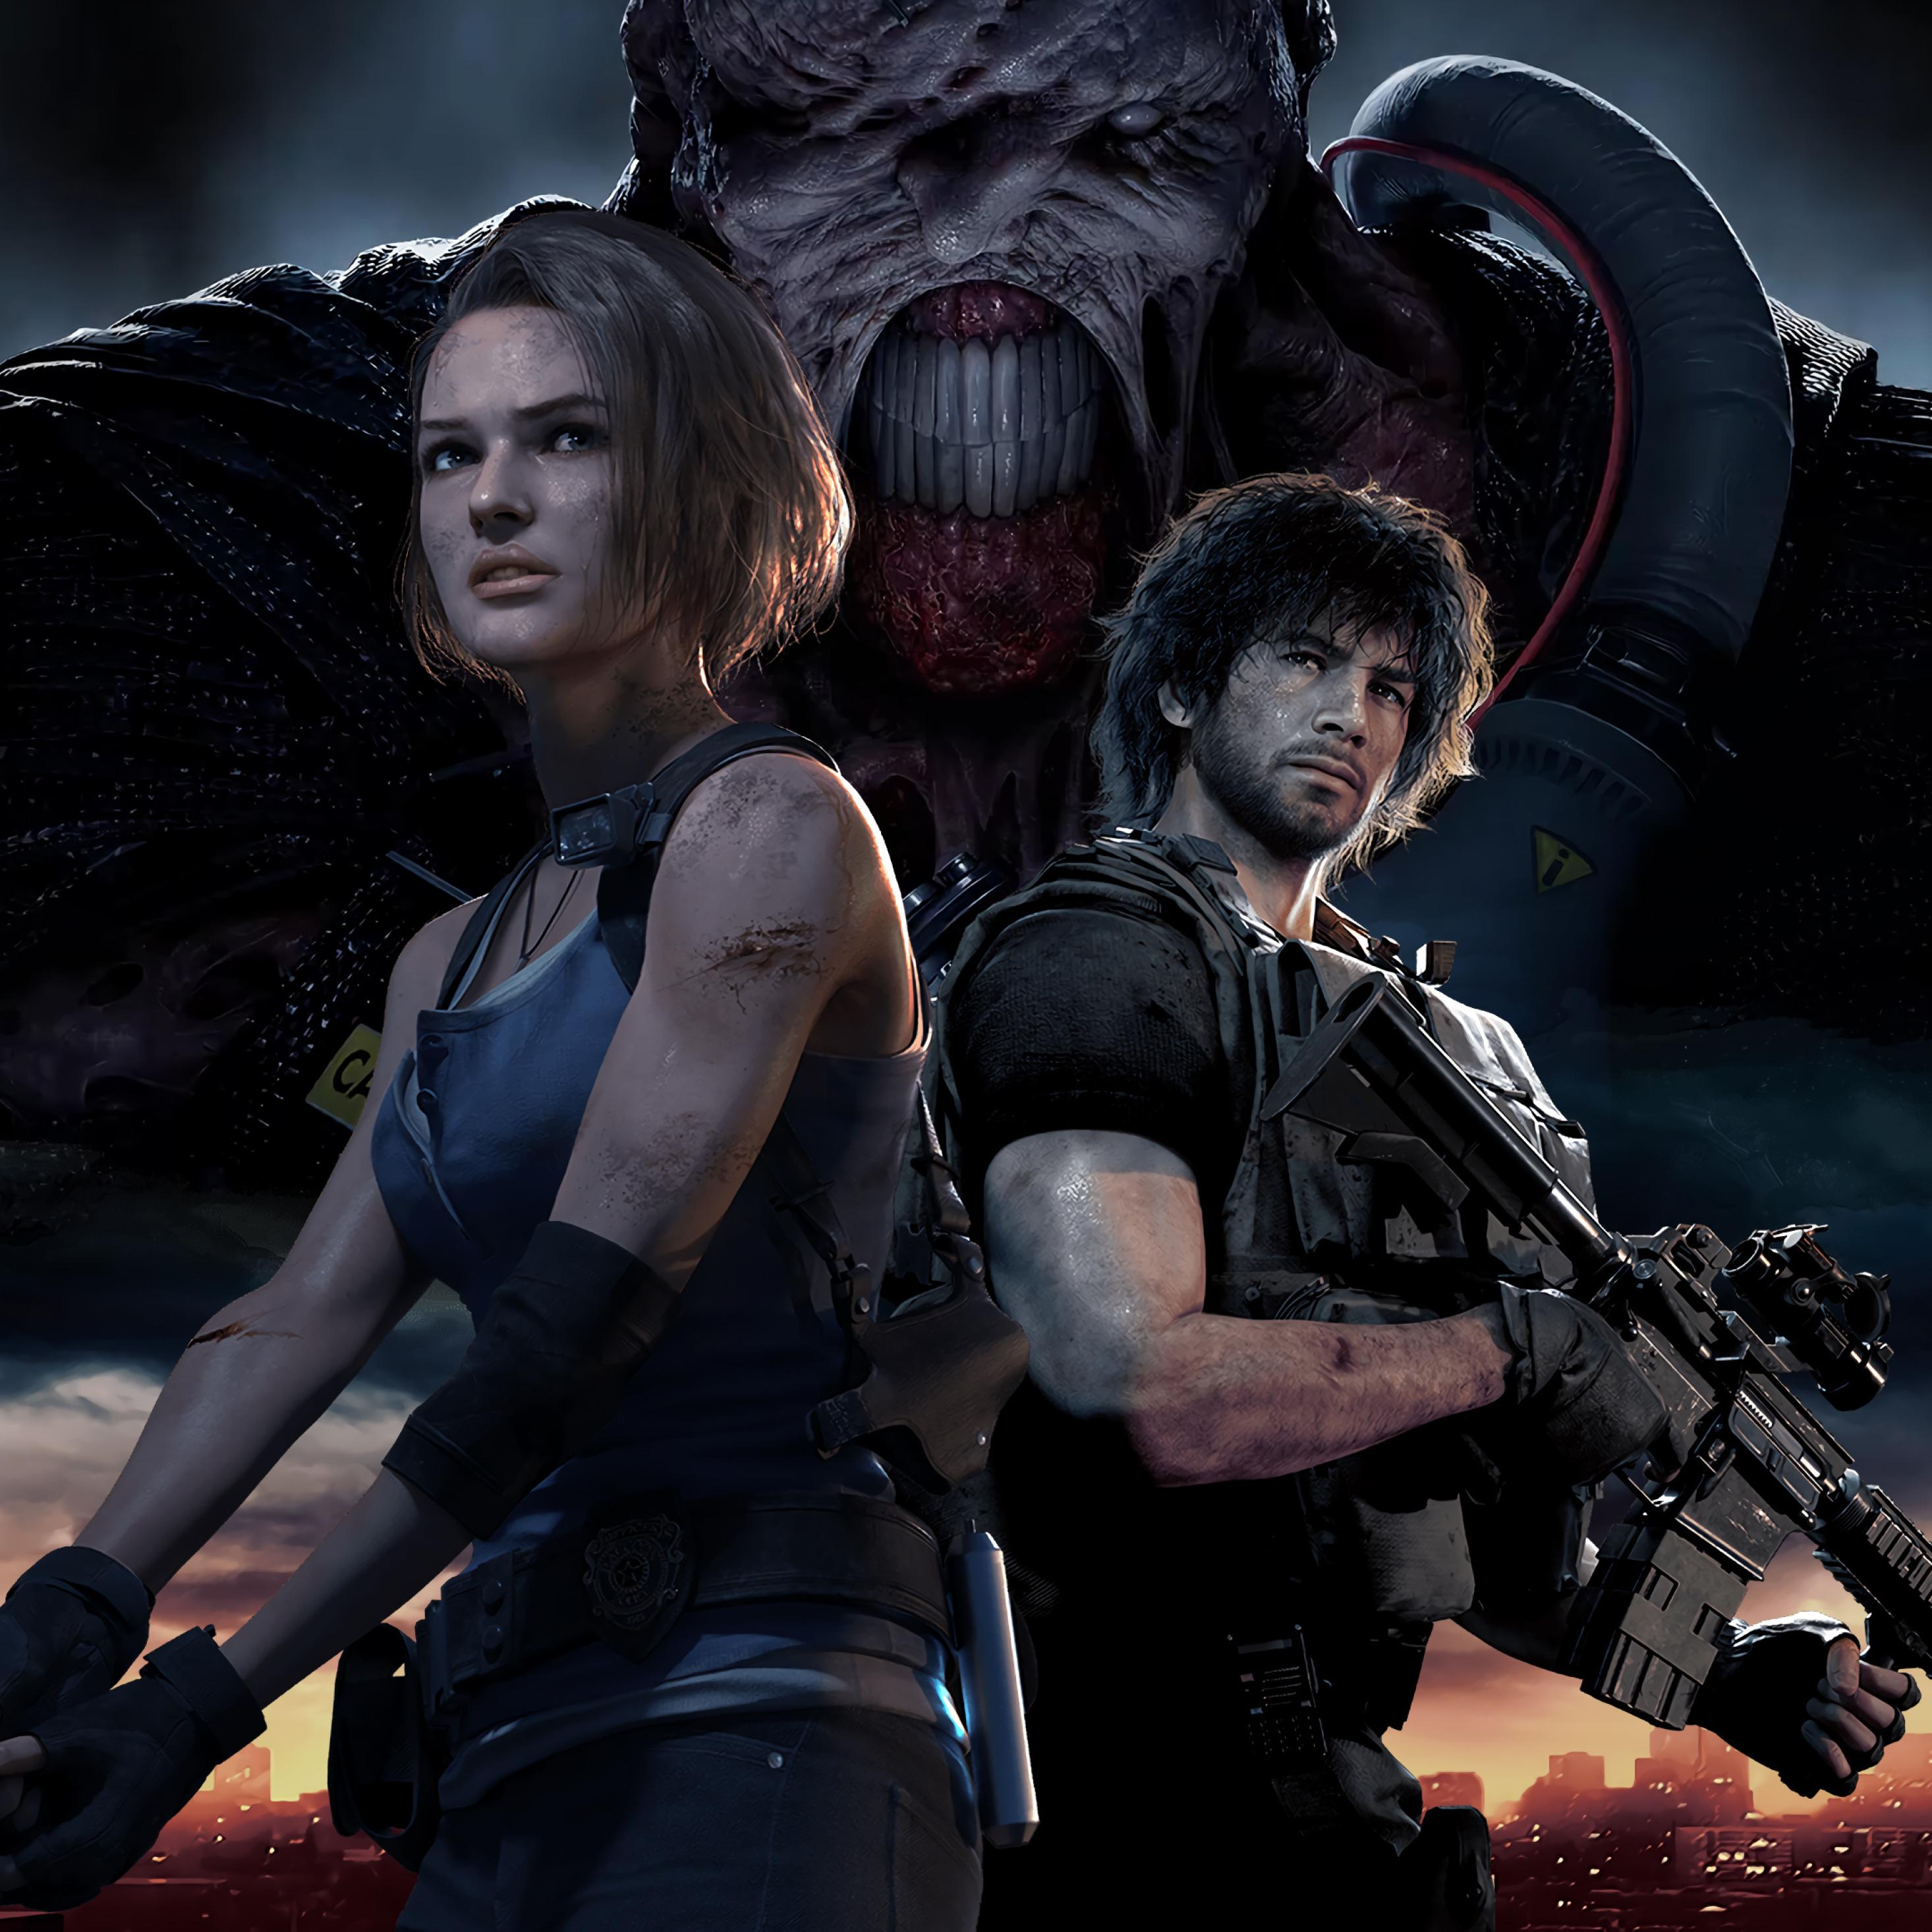 2932x2932 Resident Evil 3 Remake Characters Ipad Pro Retina